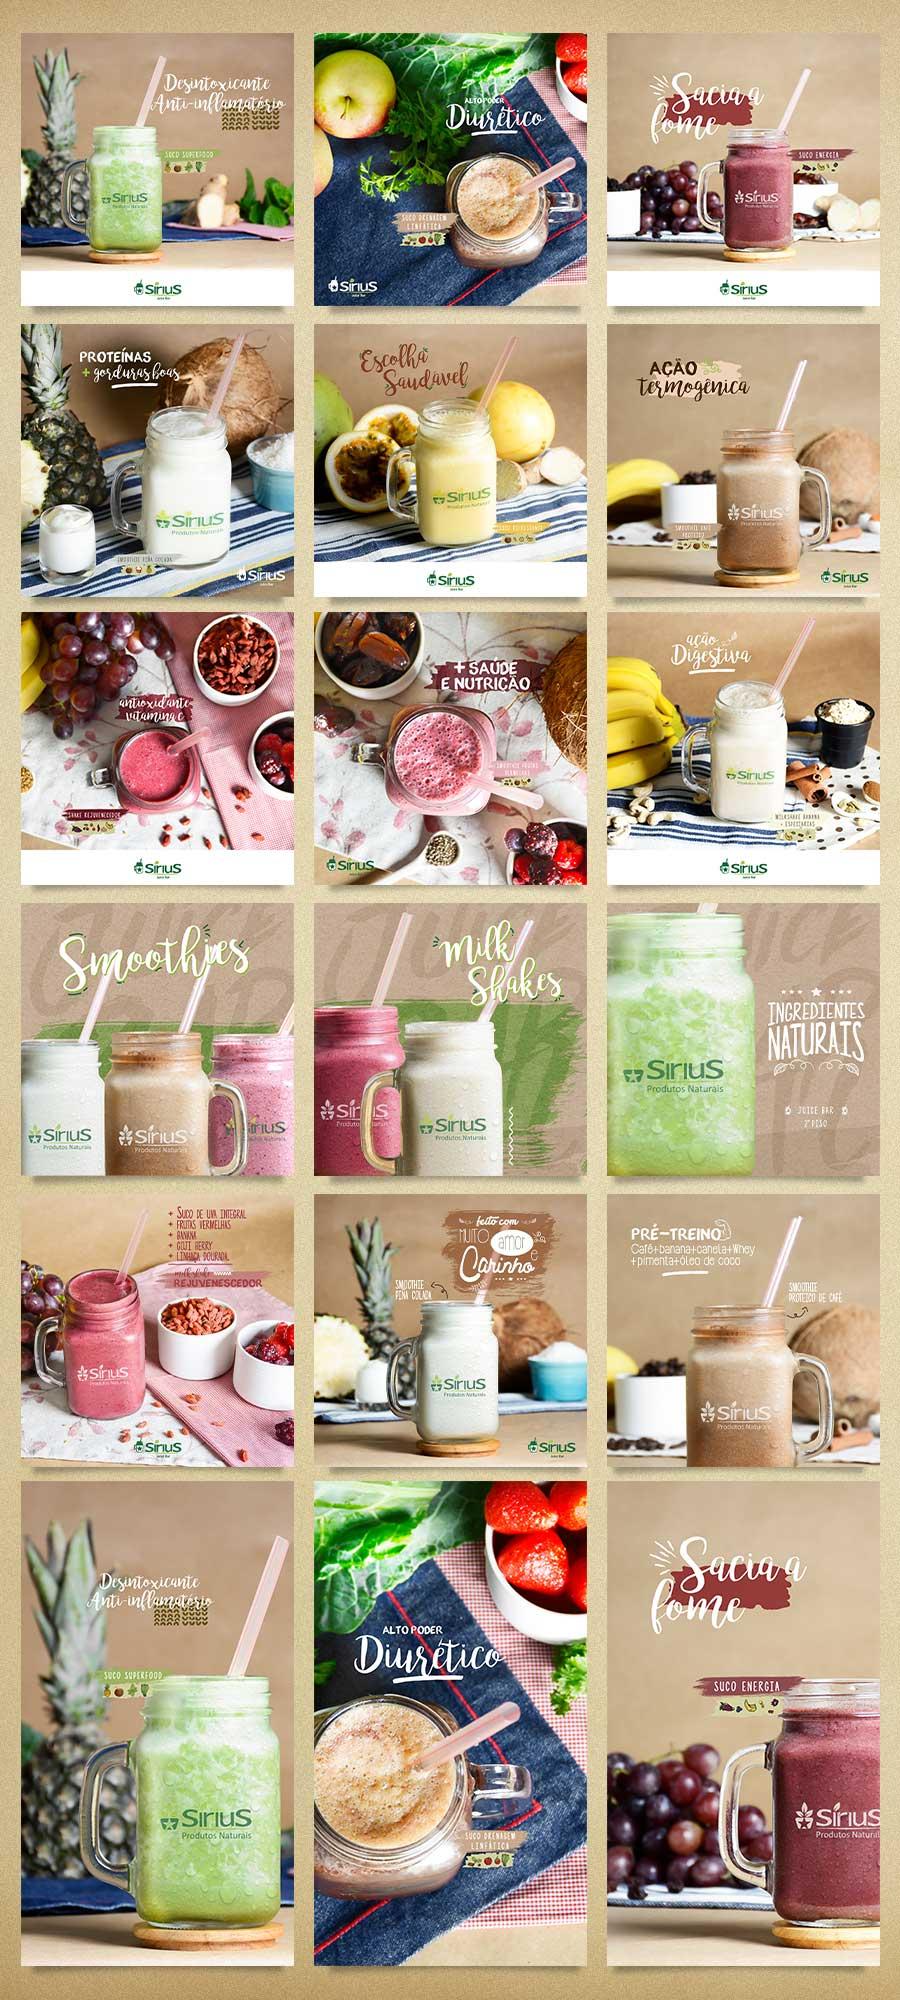 postagens sucos sirius produtos naturais